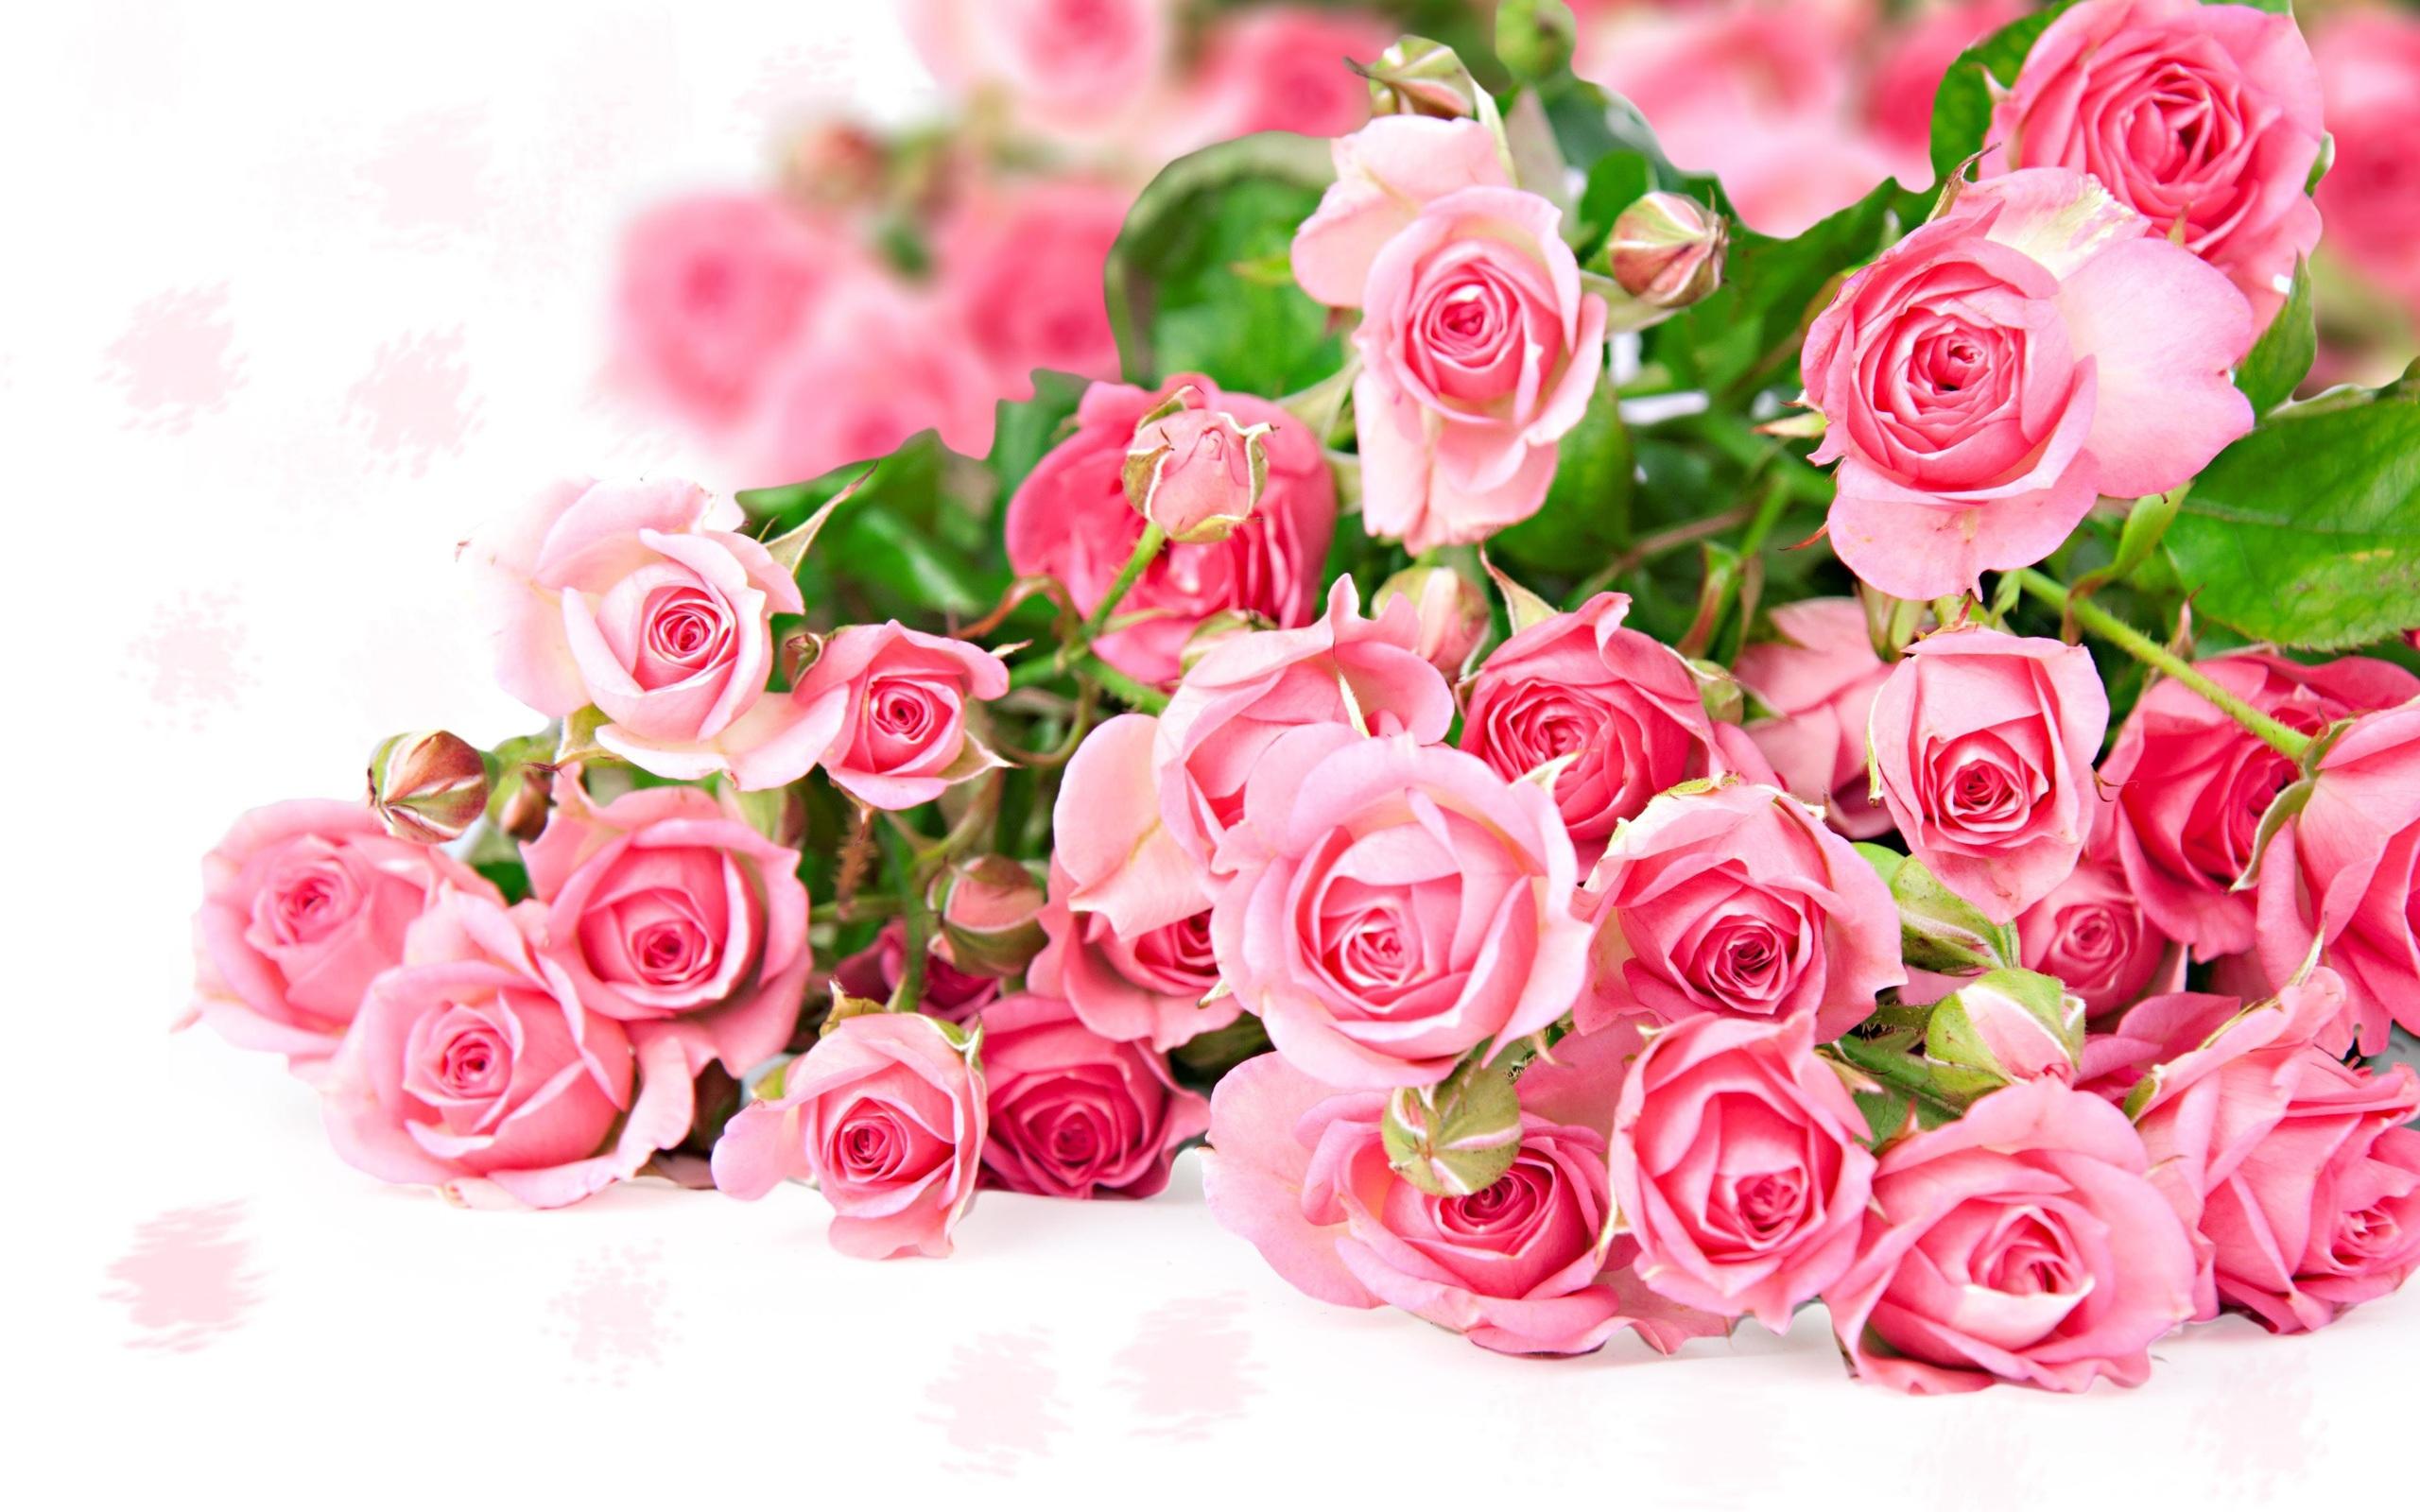 Wallpaper pink rose flower bouquet romantic color 2560x1600 hd download this wallpaper izmirmasajfo